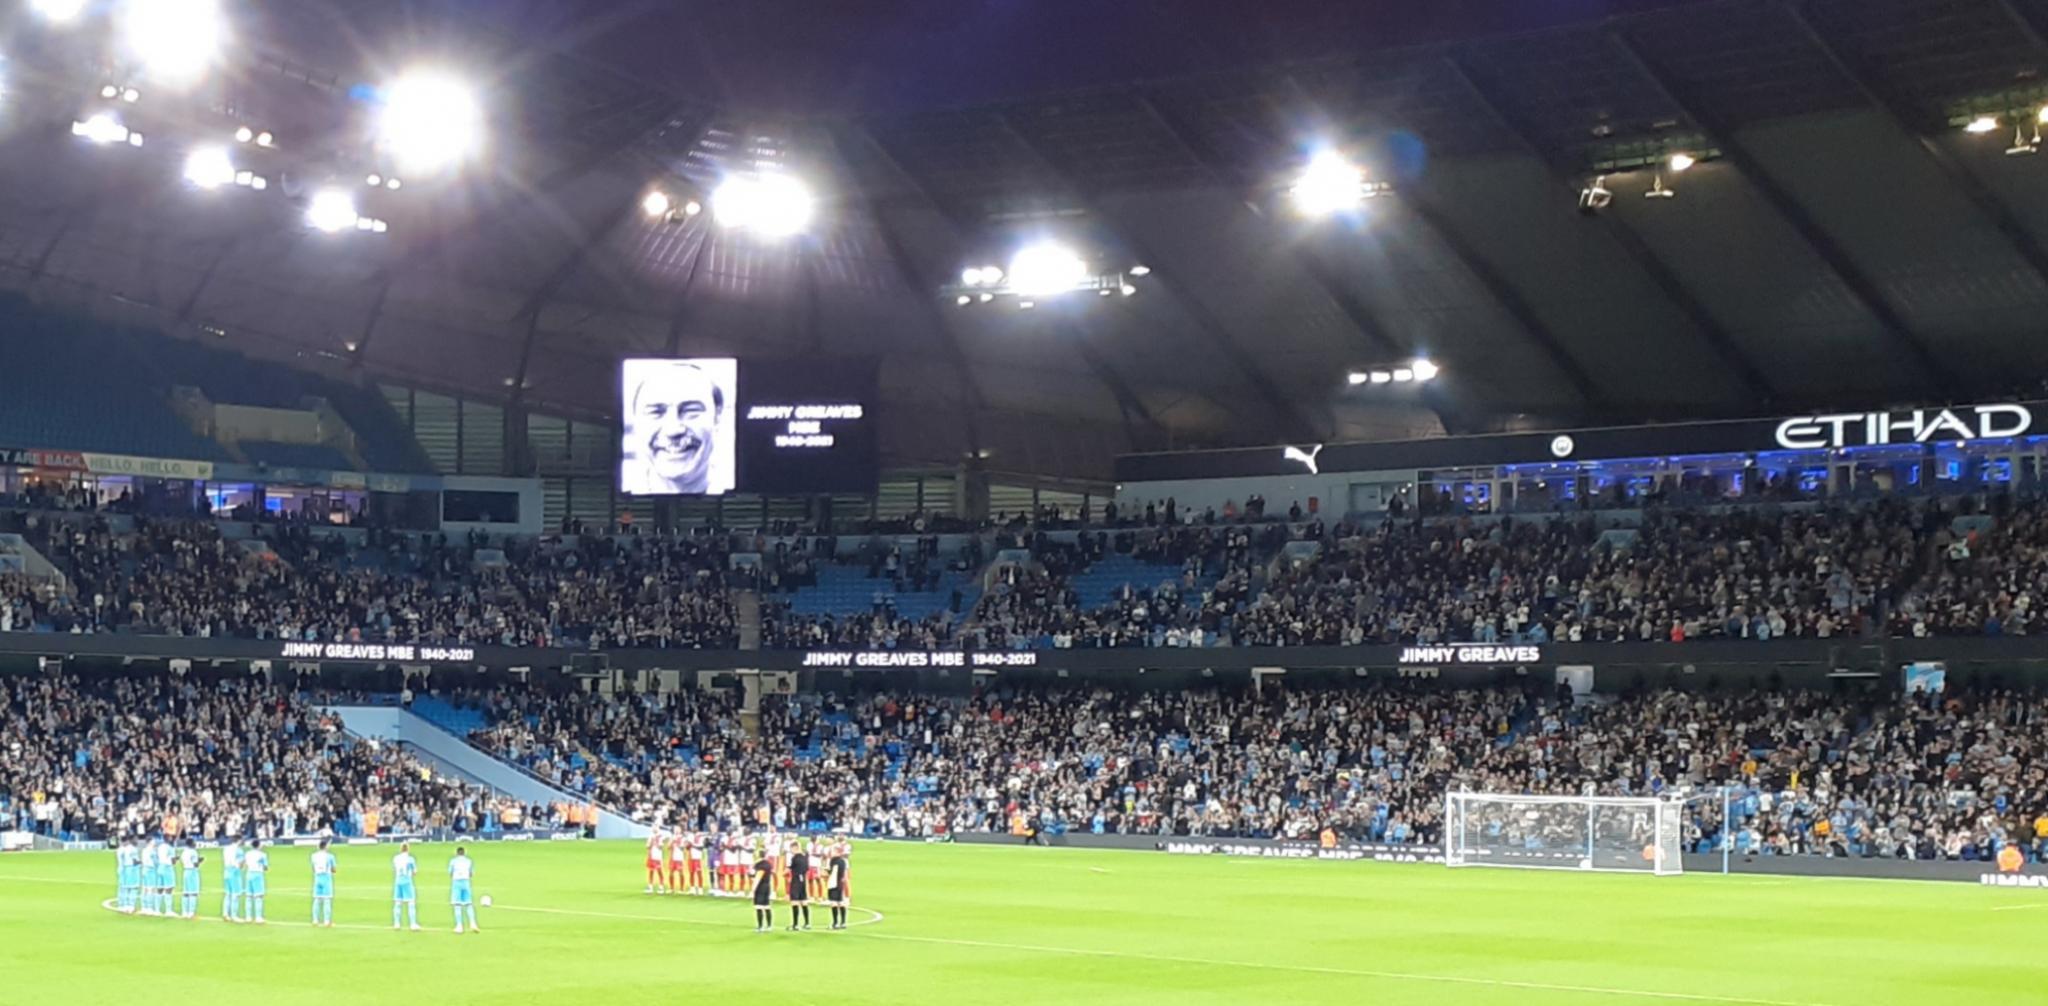 Manchester City Thread-20210921_230320-jpg